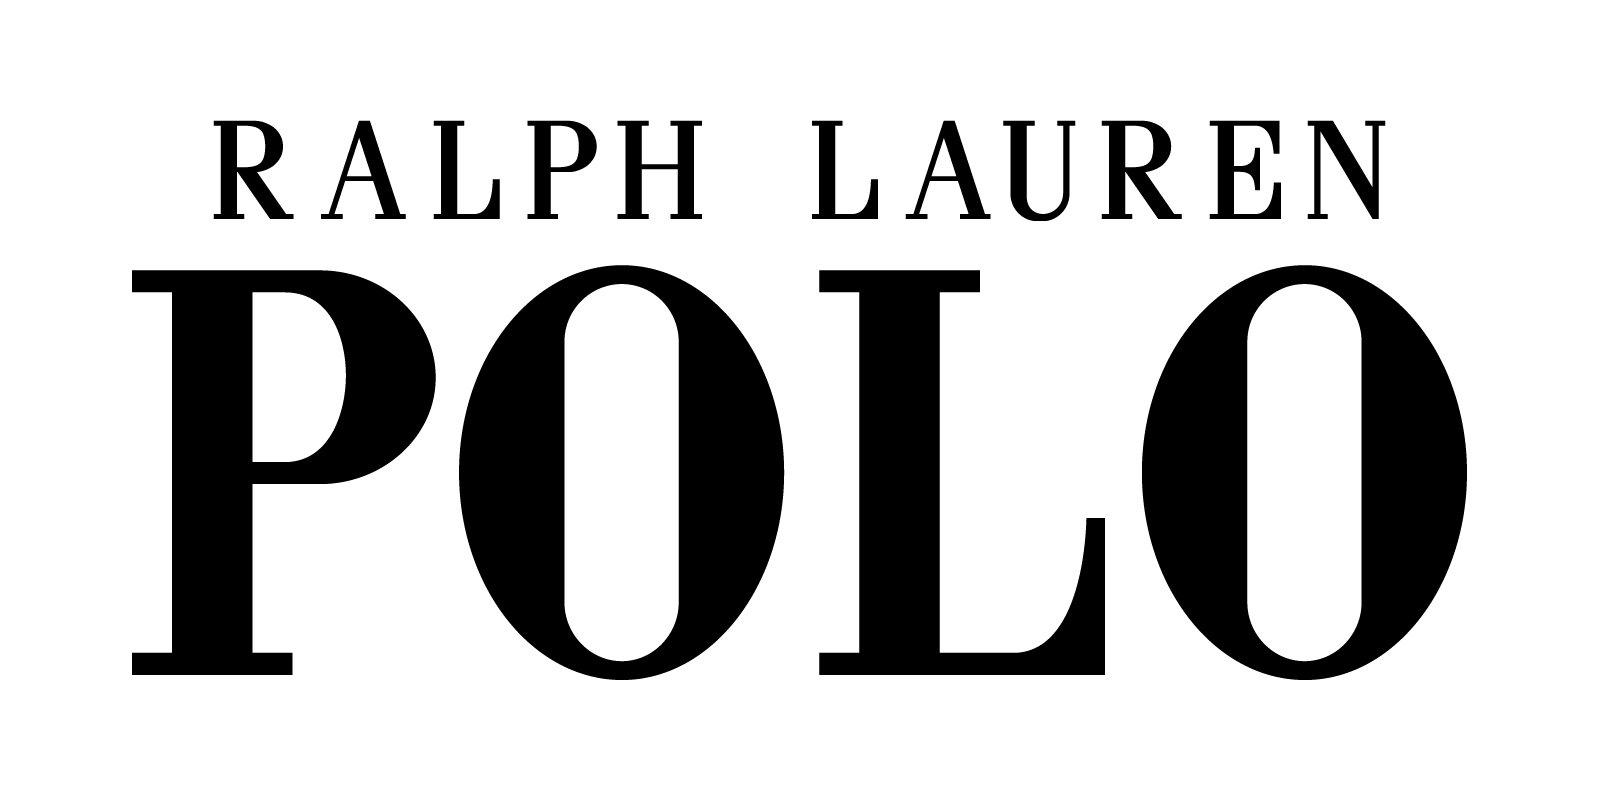 Ralph Lauren Logo Ralph Lauren Symbol Meaning History And Evolution